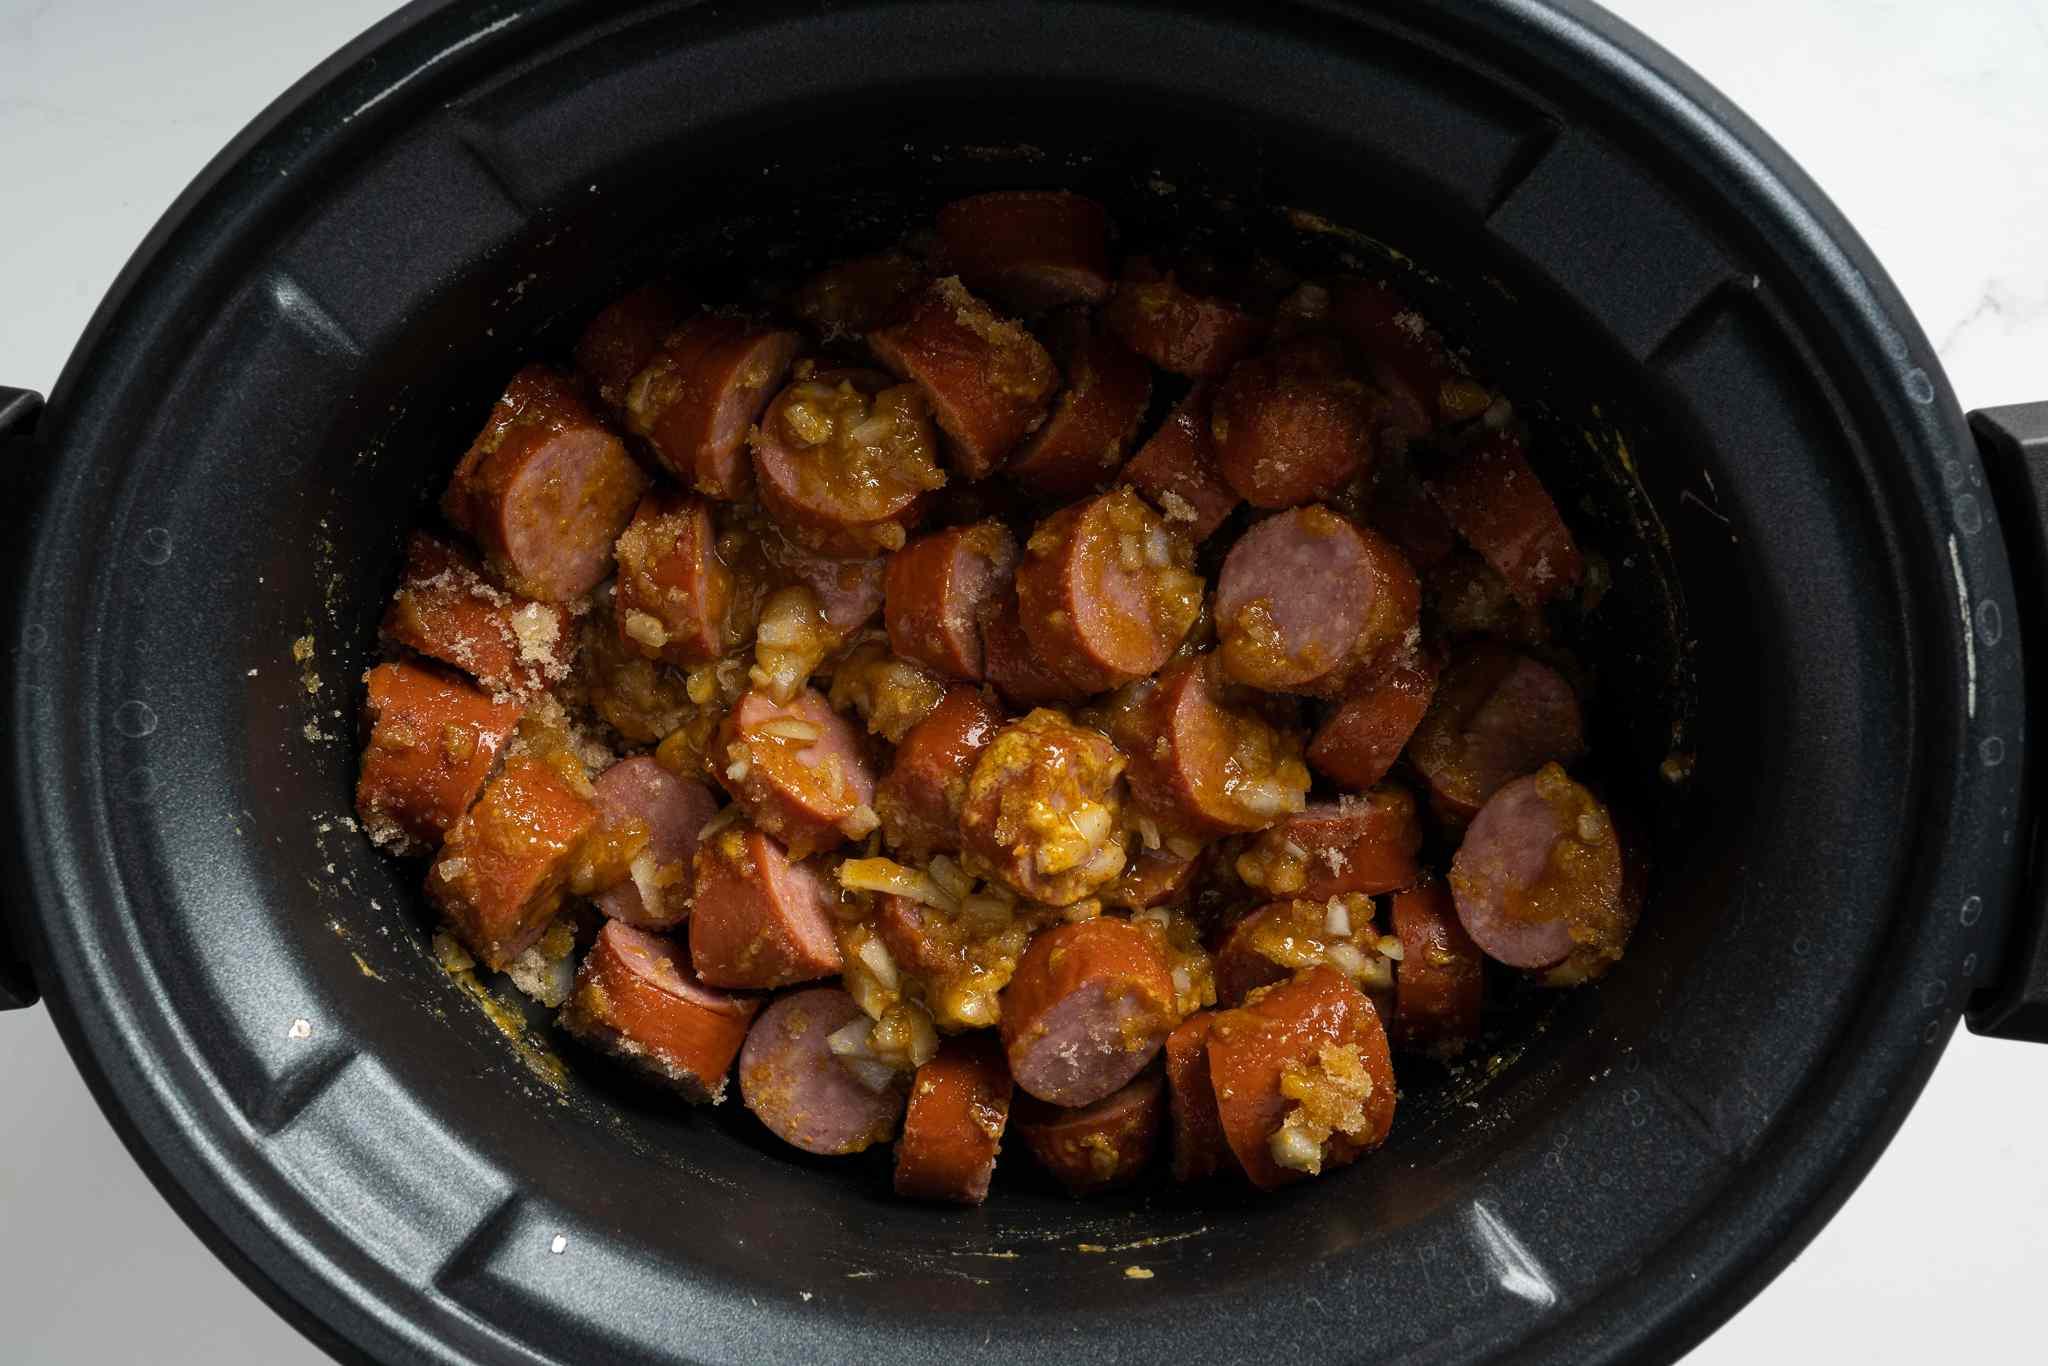 In the crock pot, combine brown sugar, mustard, and onion; add the kielbasa and stir well